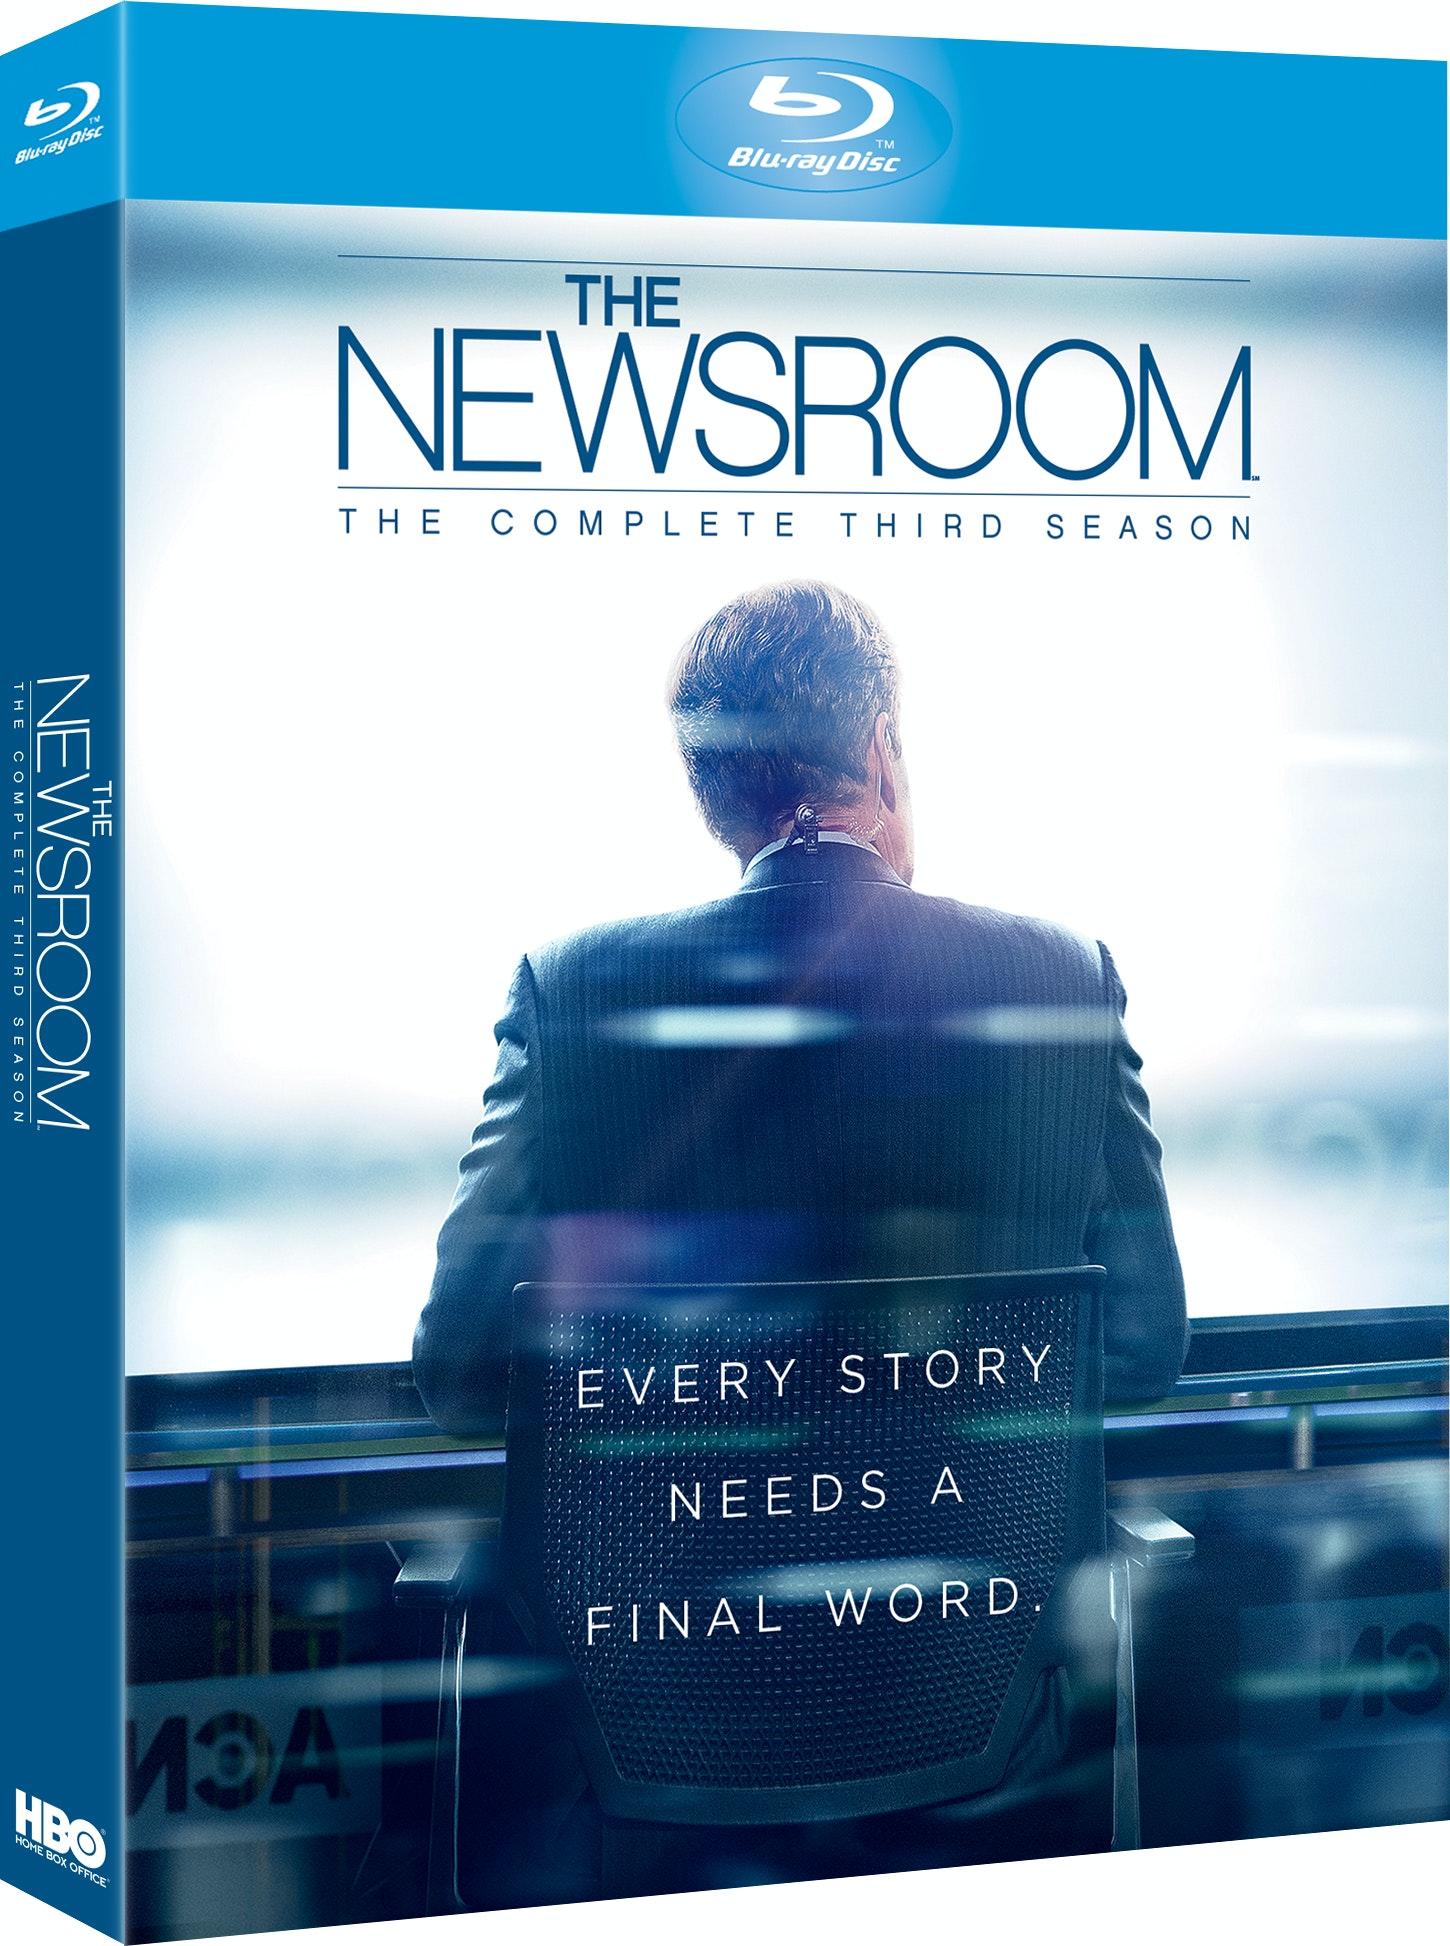 The Newsroom series 3 sweepstakes